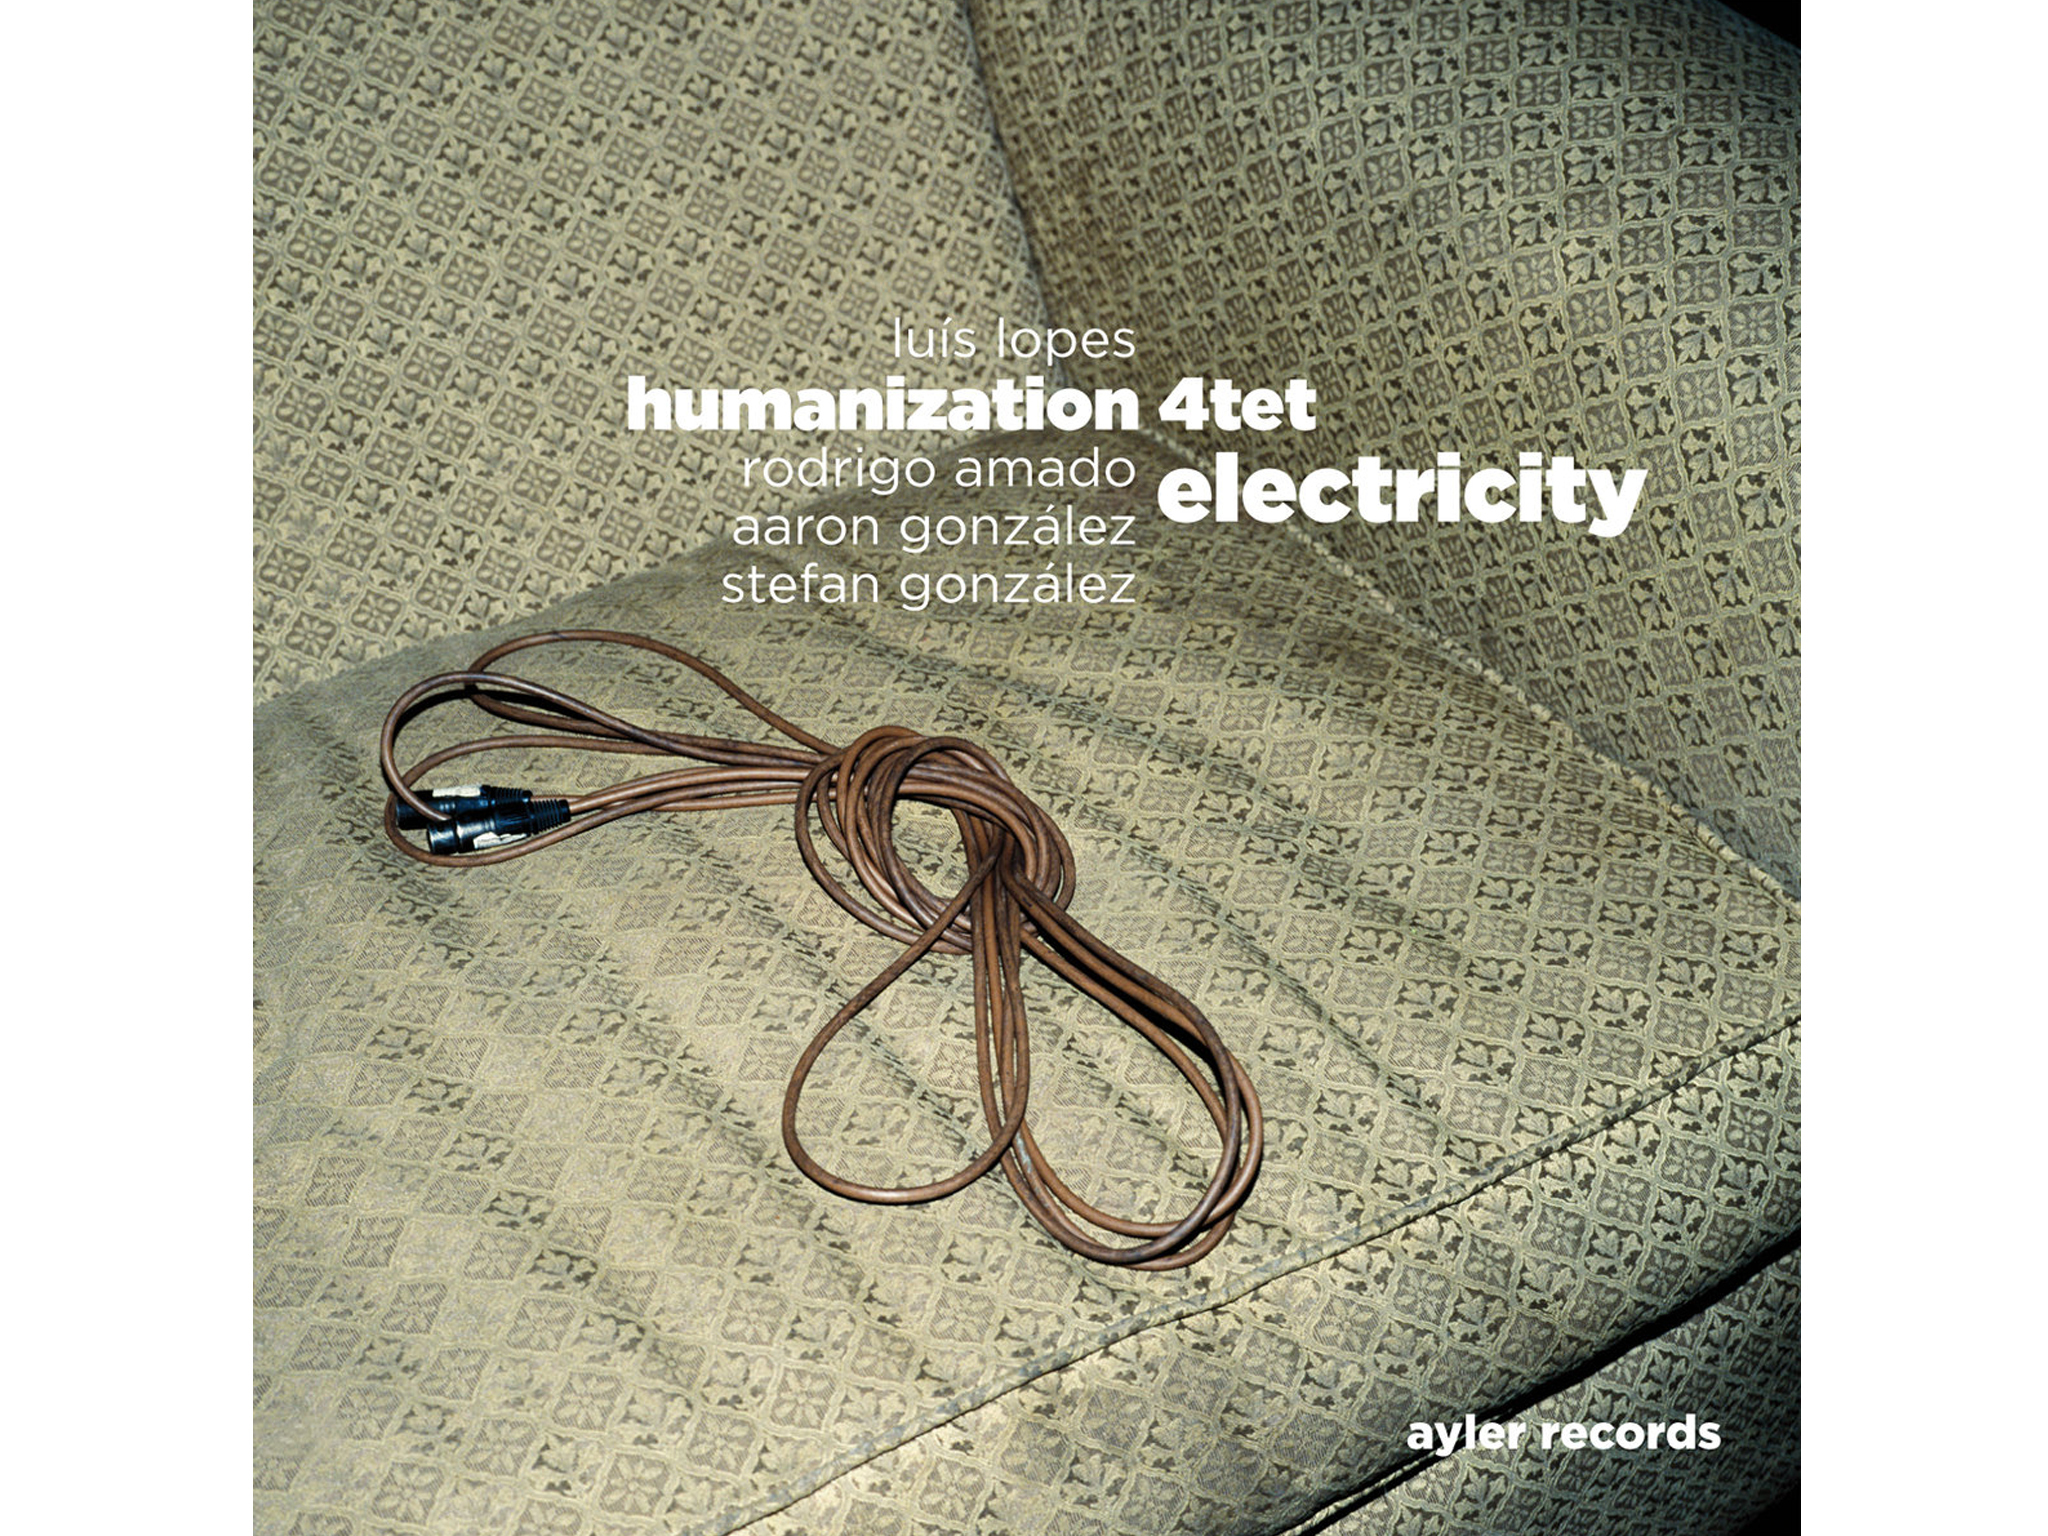 Luis Lopes Humanization 4tet - Electricity